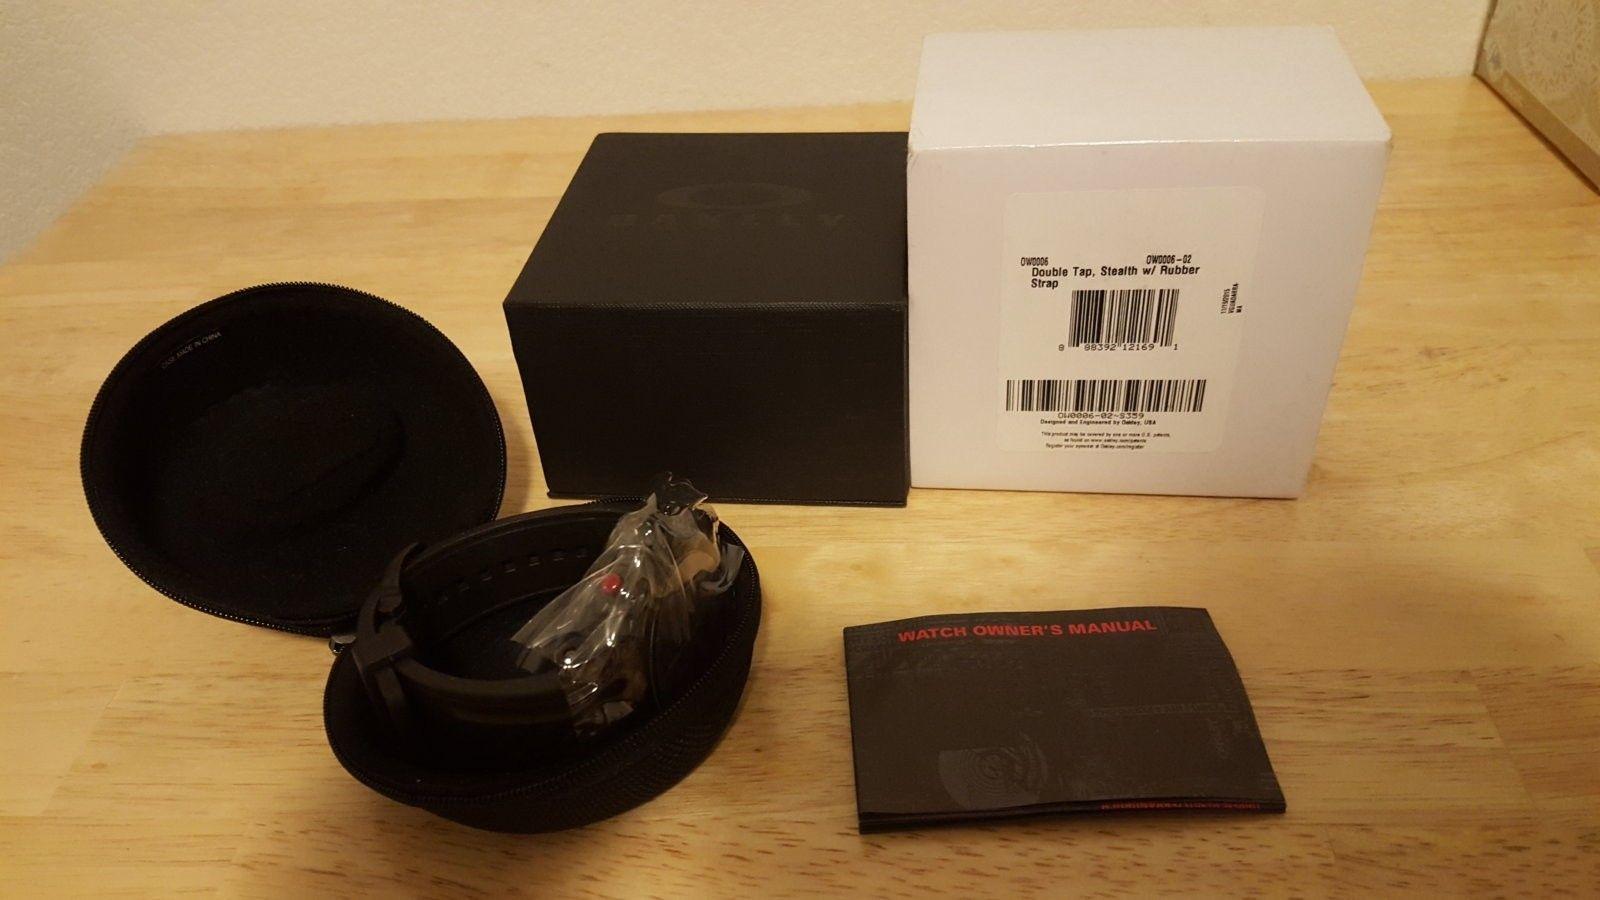 BNIB Stealth Double Tap Watch $450 Shipped - 20160330_003837.jpg